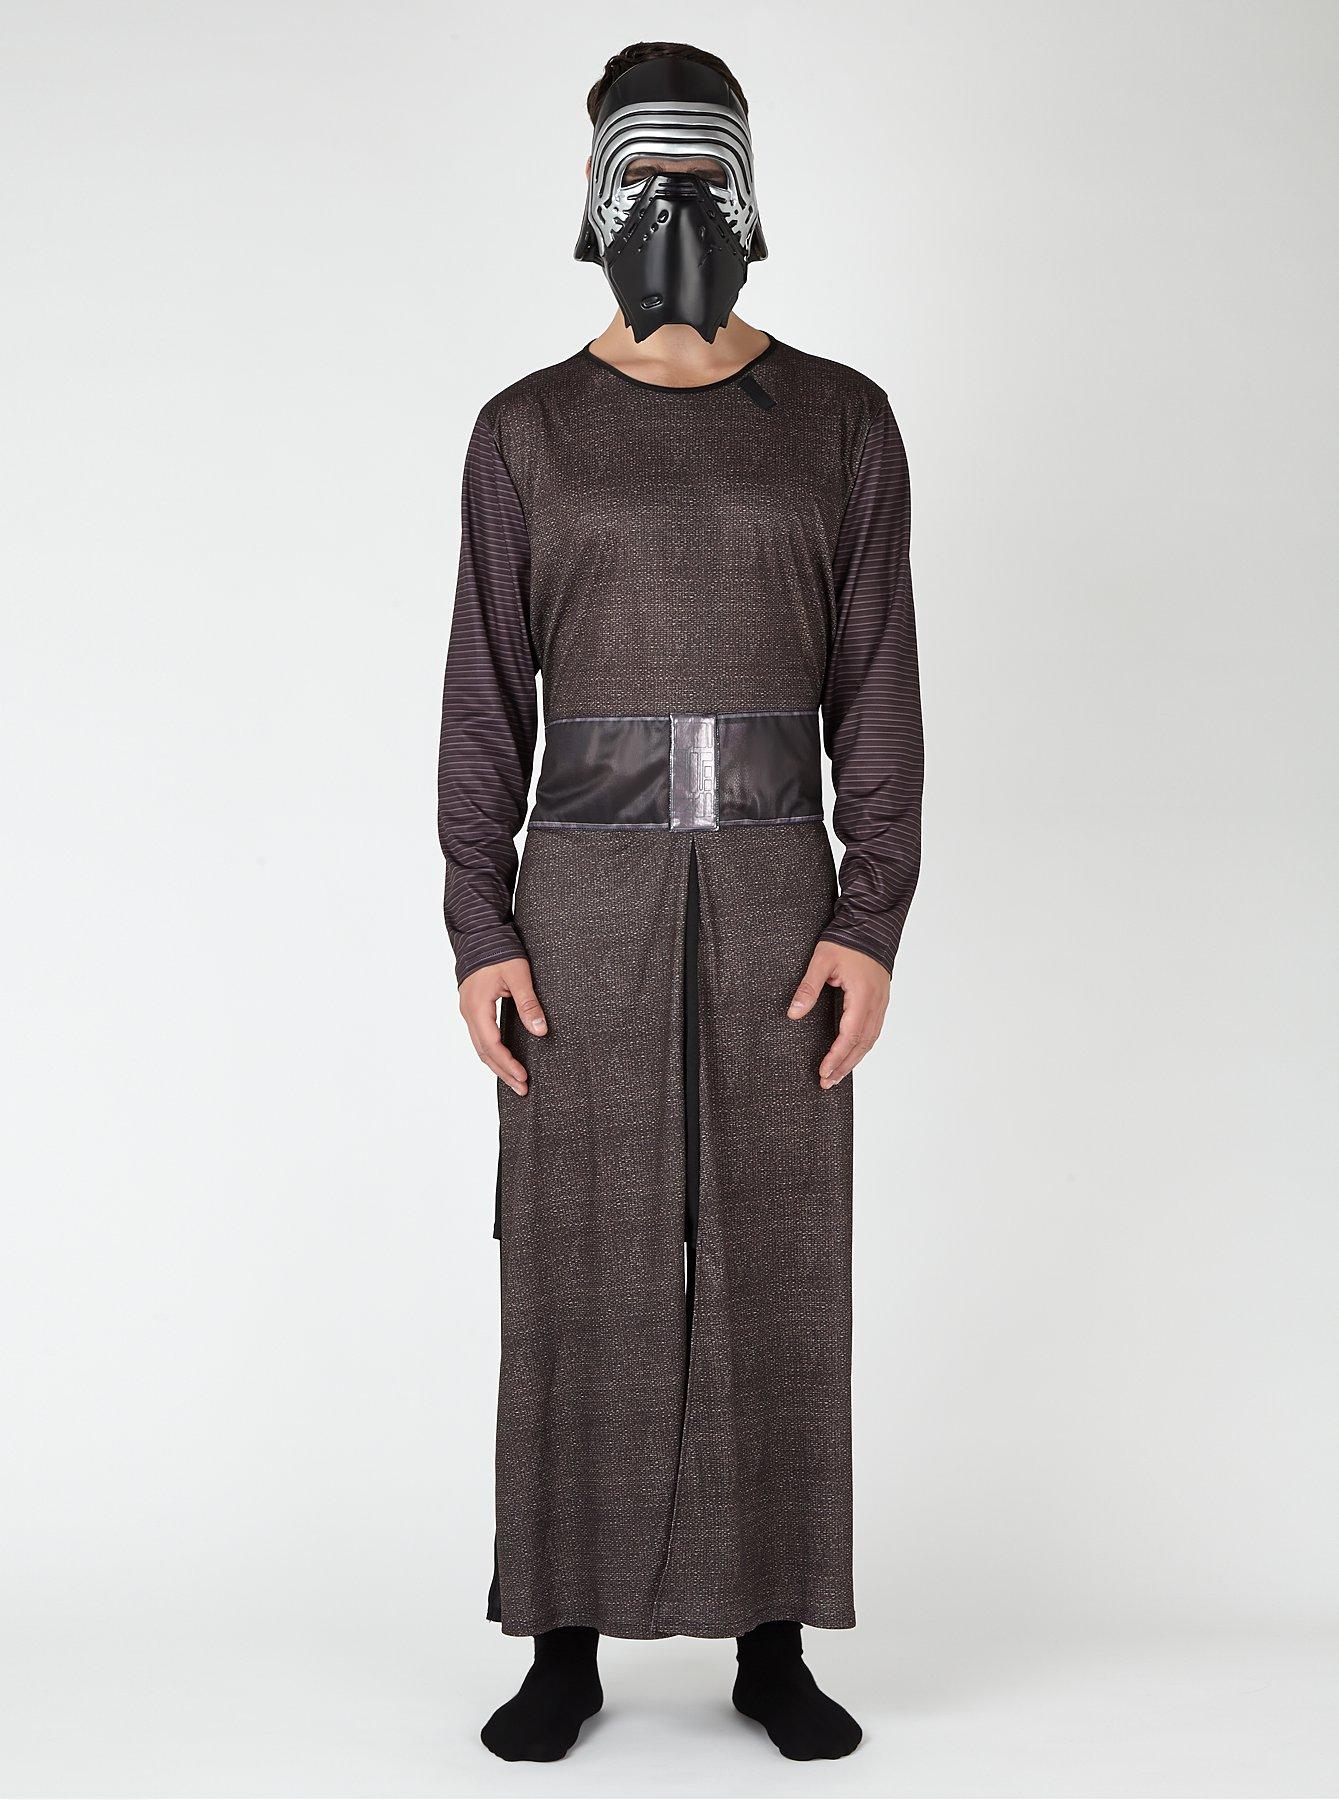 Adult Star Wars Kylo Ren Fancy Dress Costume | Men | George at ASDA